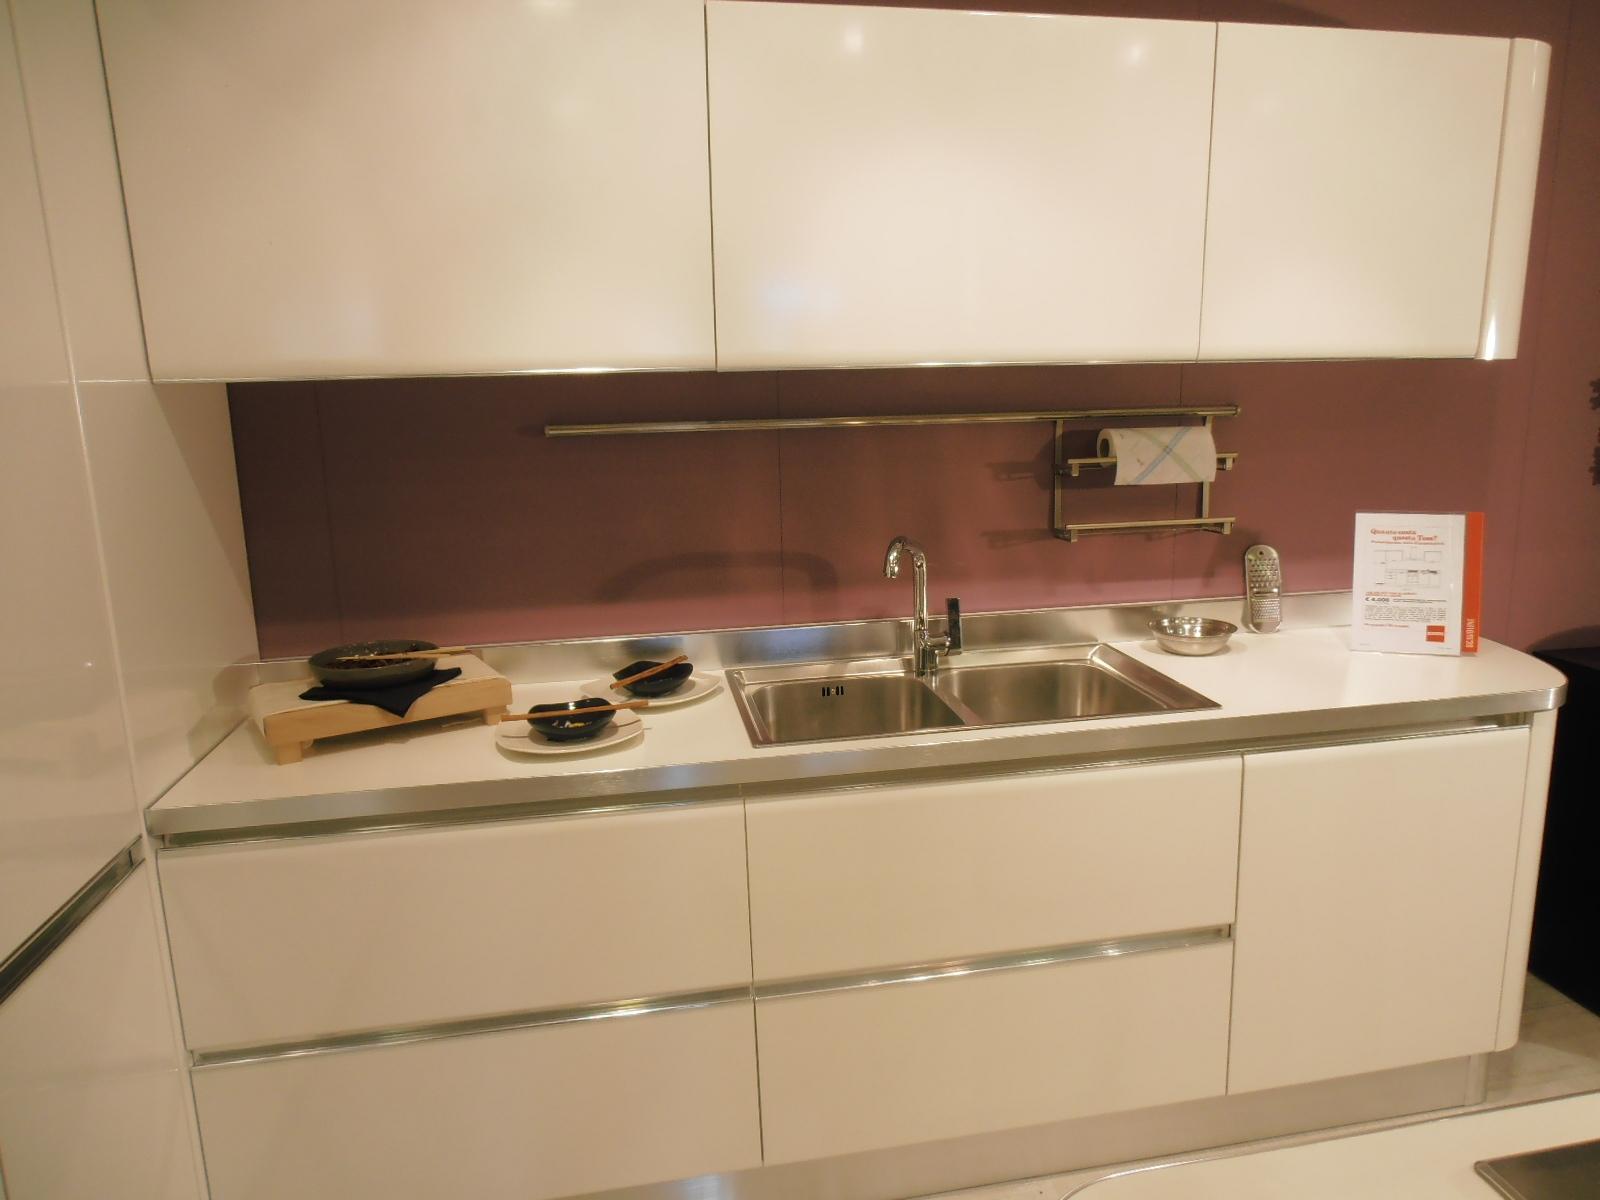 Cucina Scavolini Moderna - Idee Per La Casa - Syafir.com